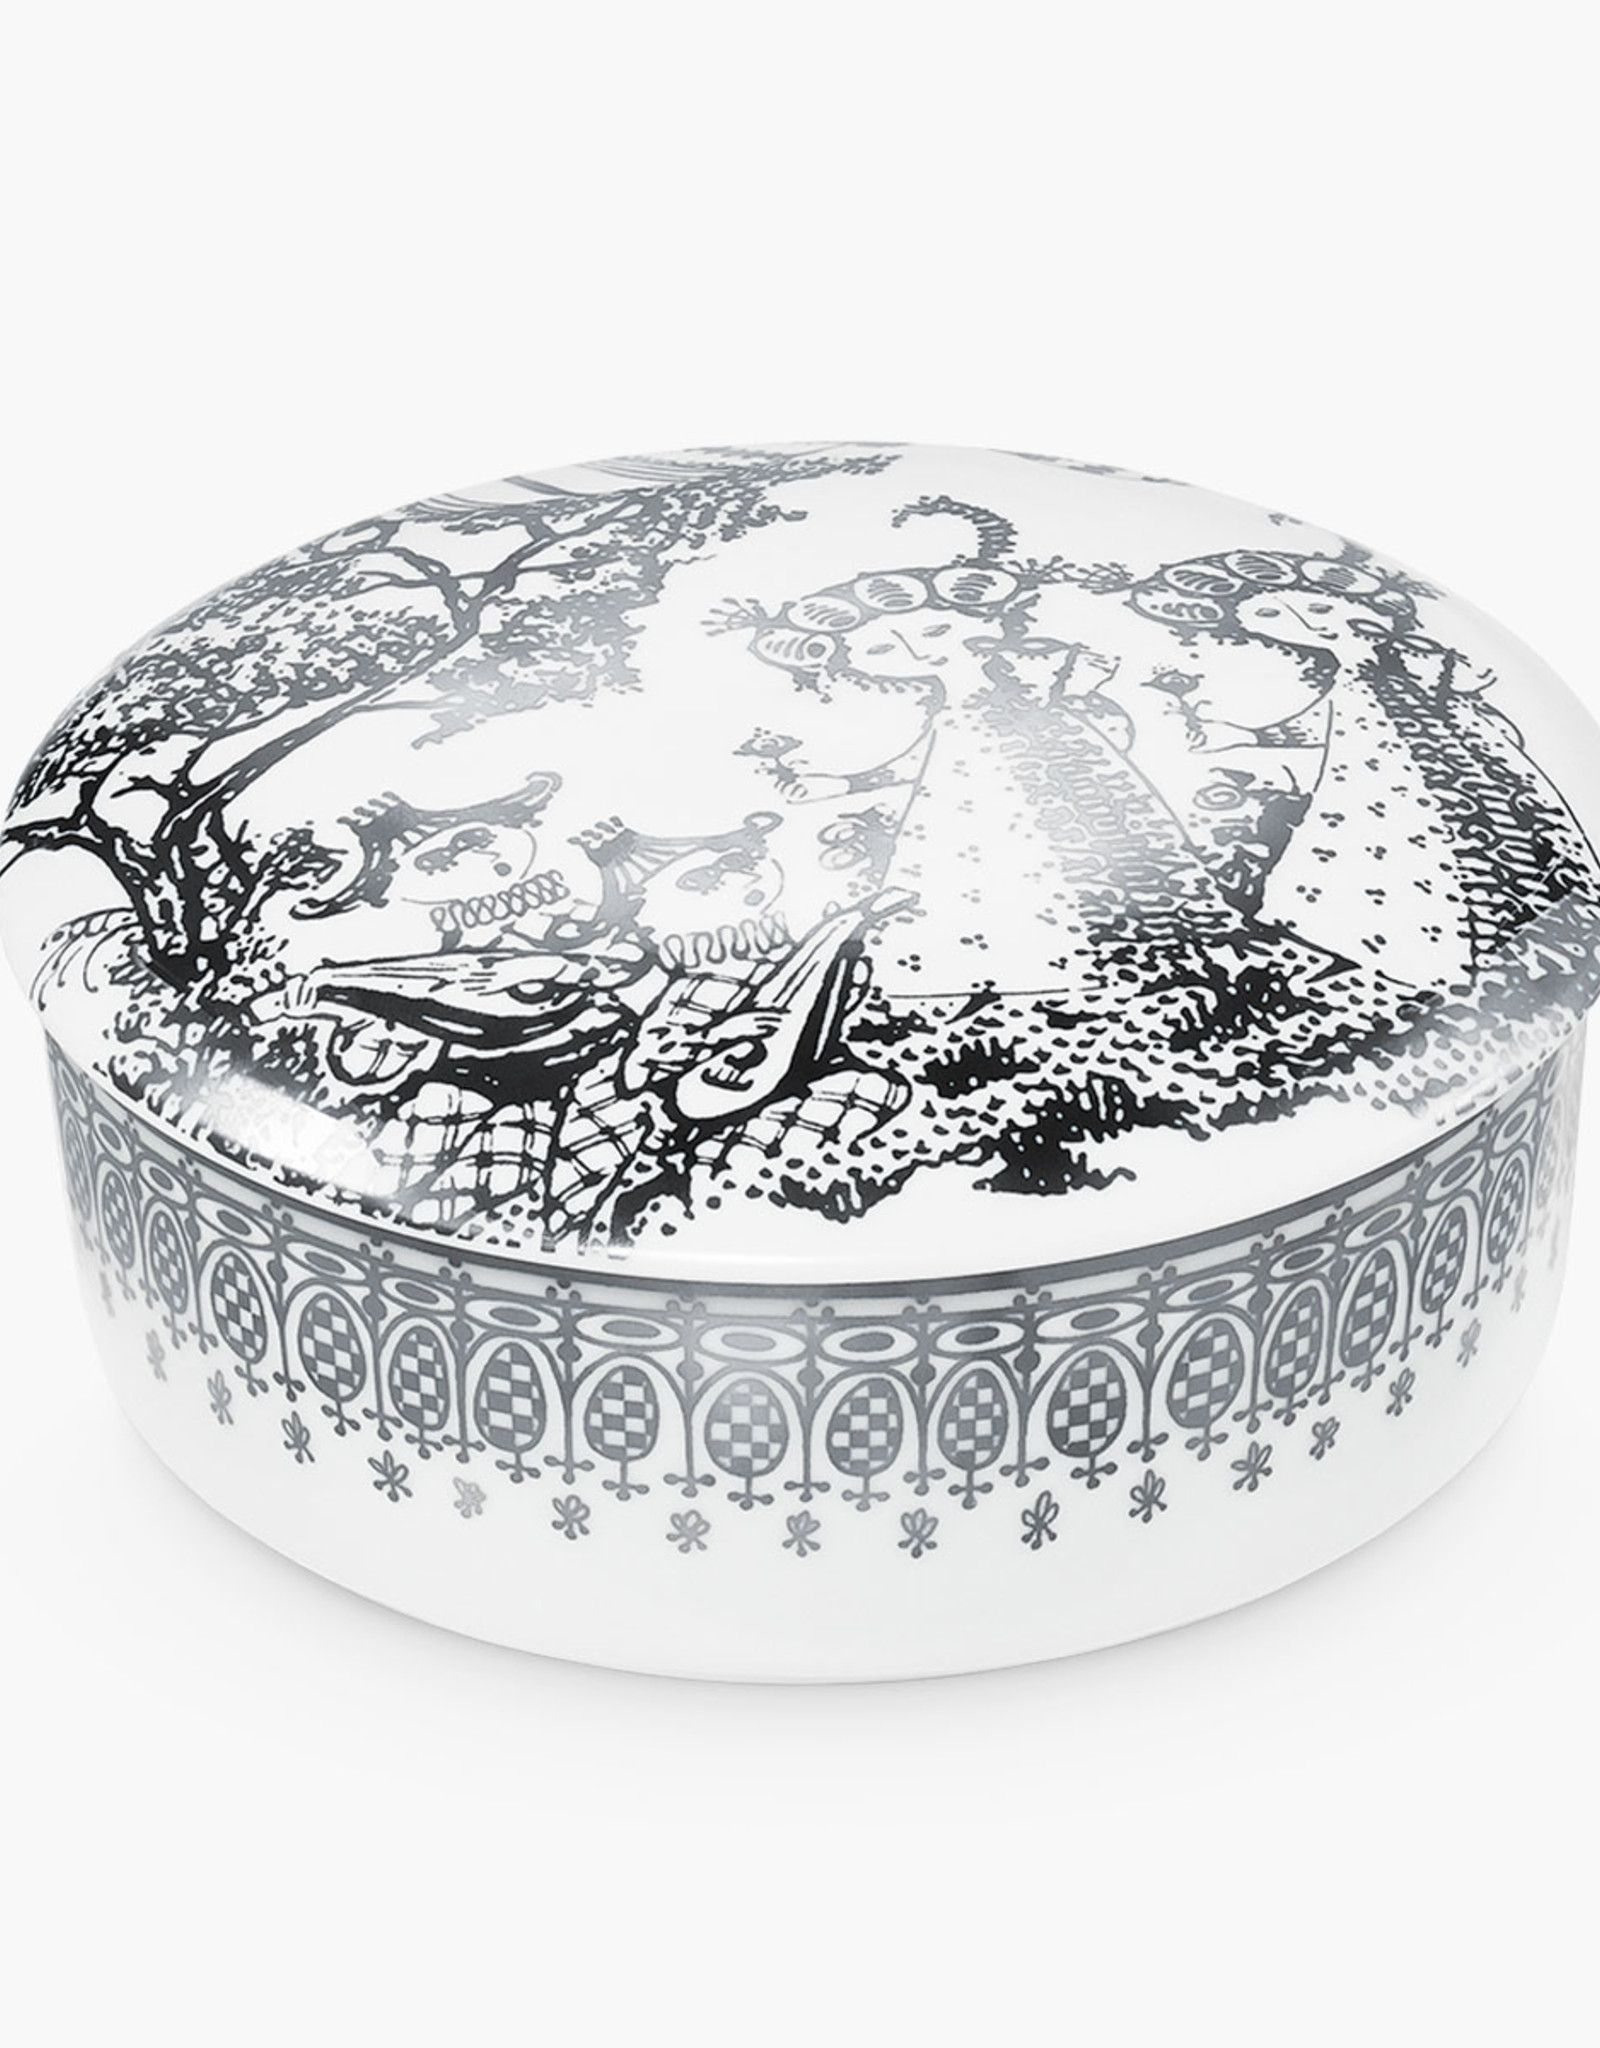 Bonbonniere Mascarade jar by Bjorn Wiinblad | Porcelain | Silver | 160mm